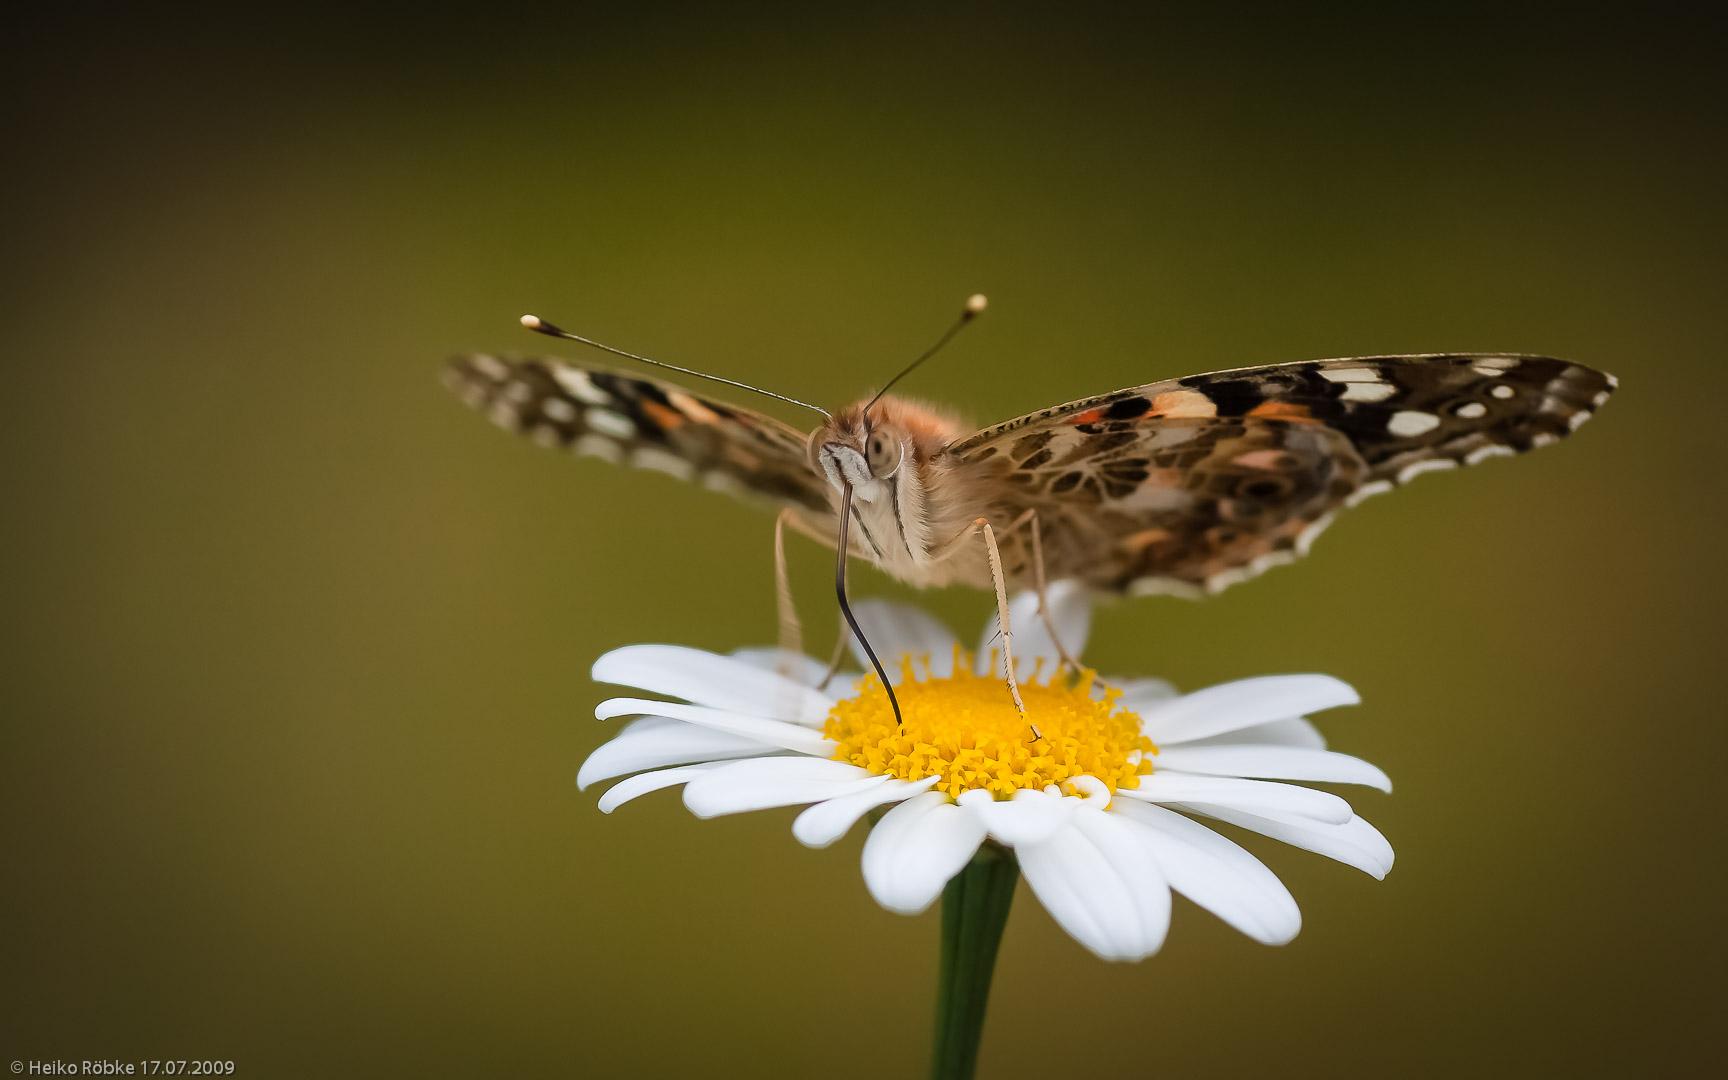 Distelfalter (Vanessa cardui Linnaeus)